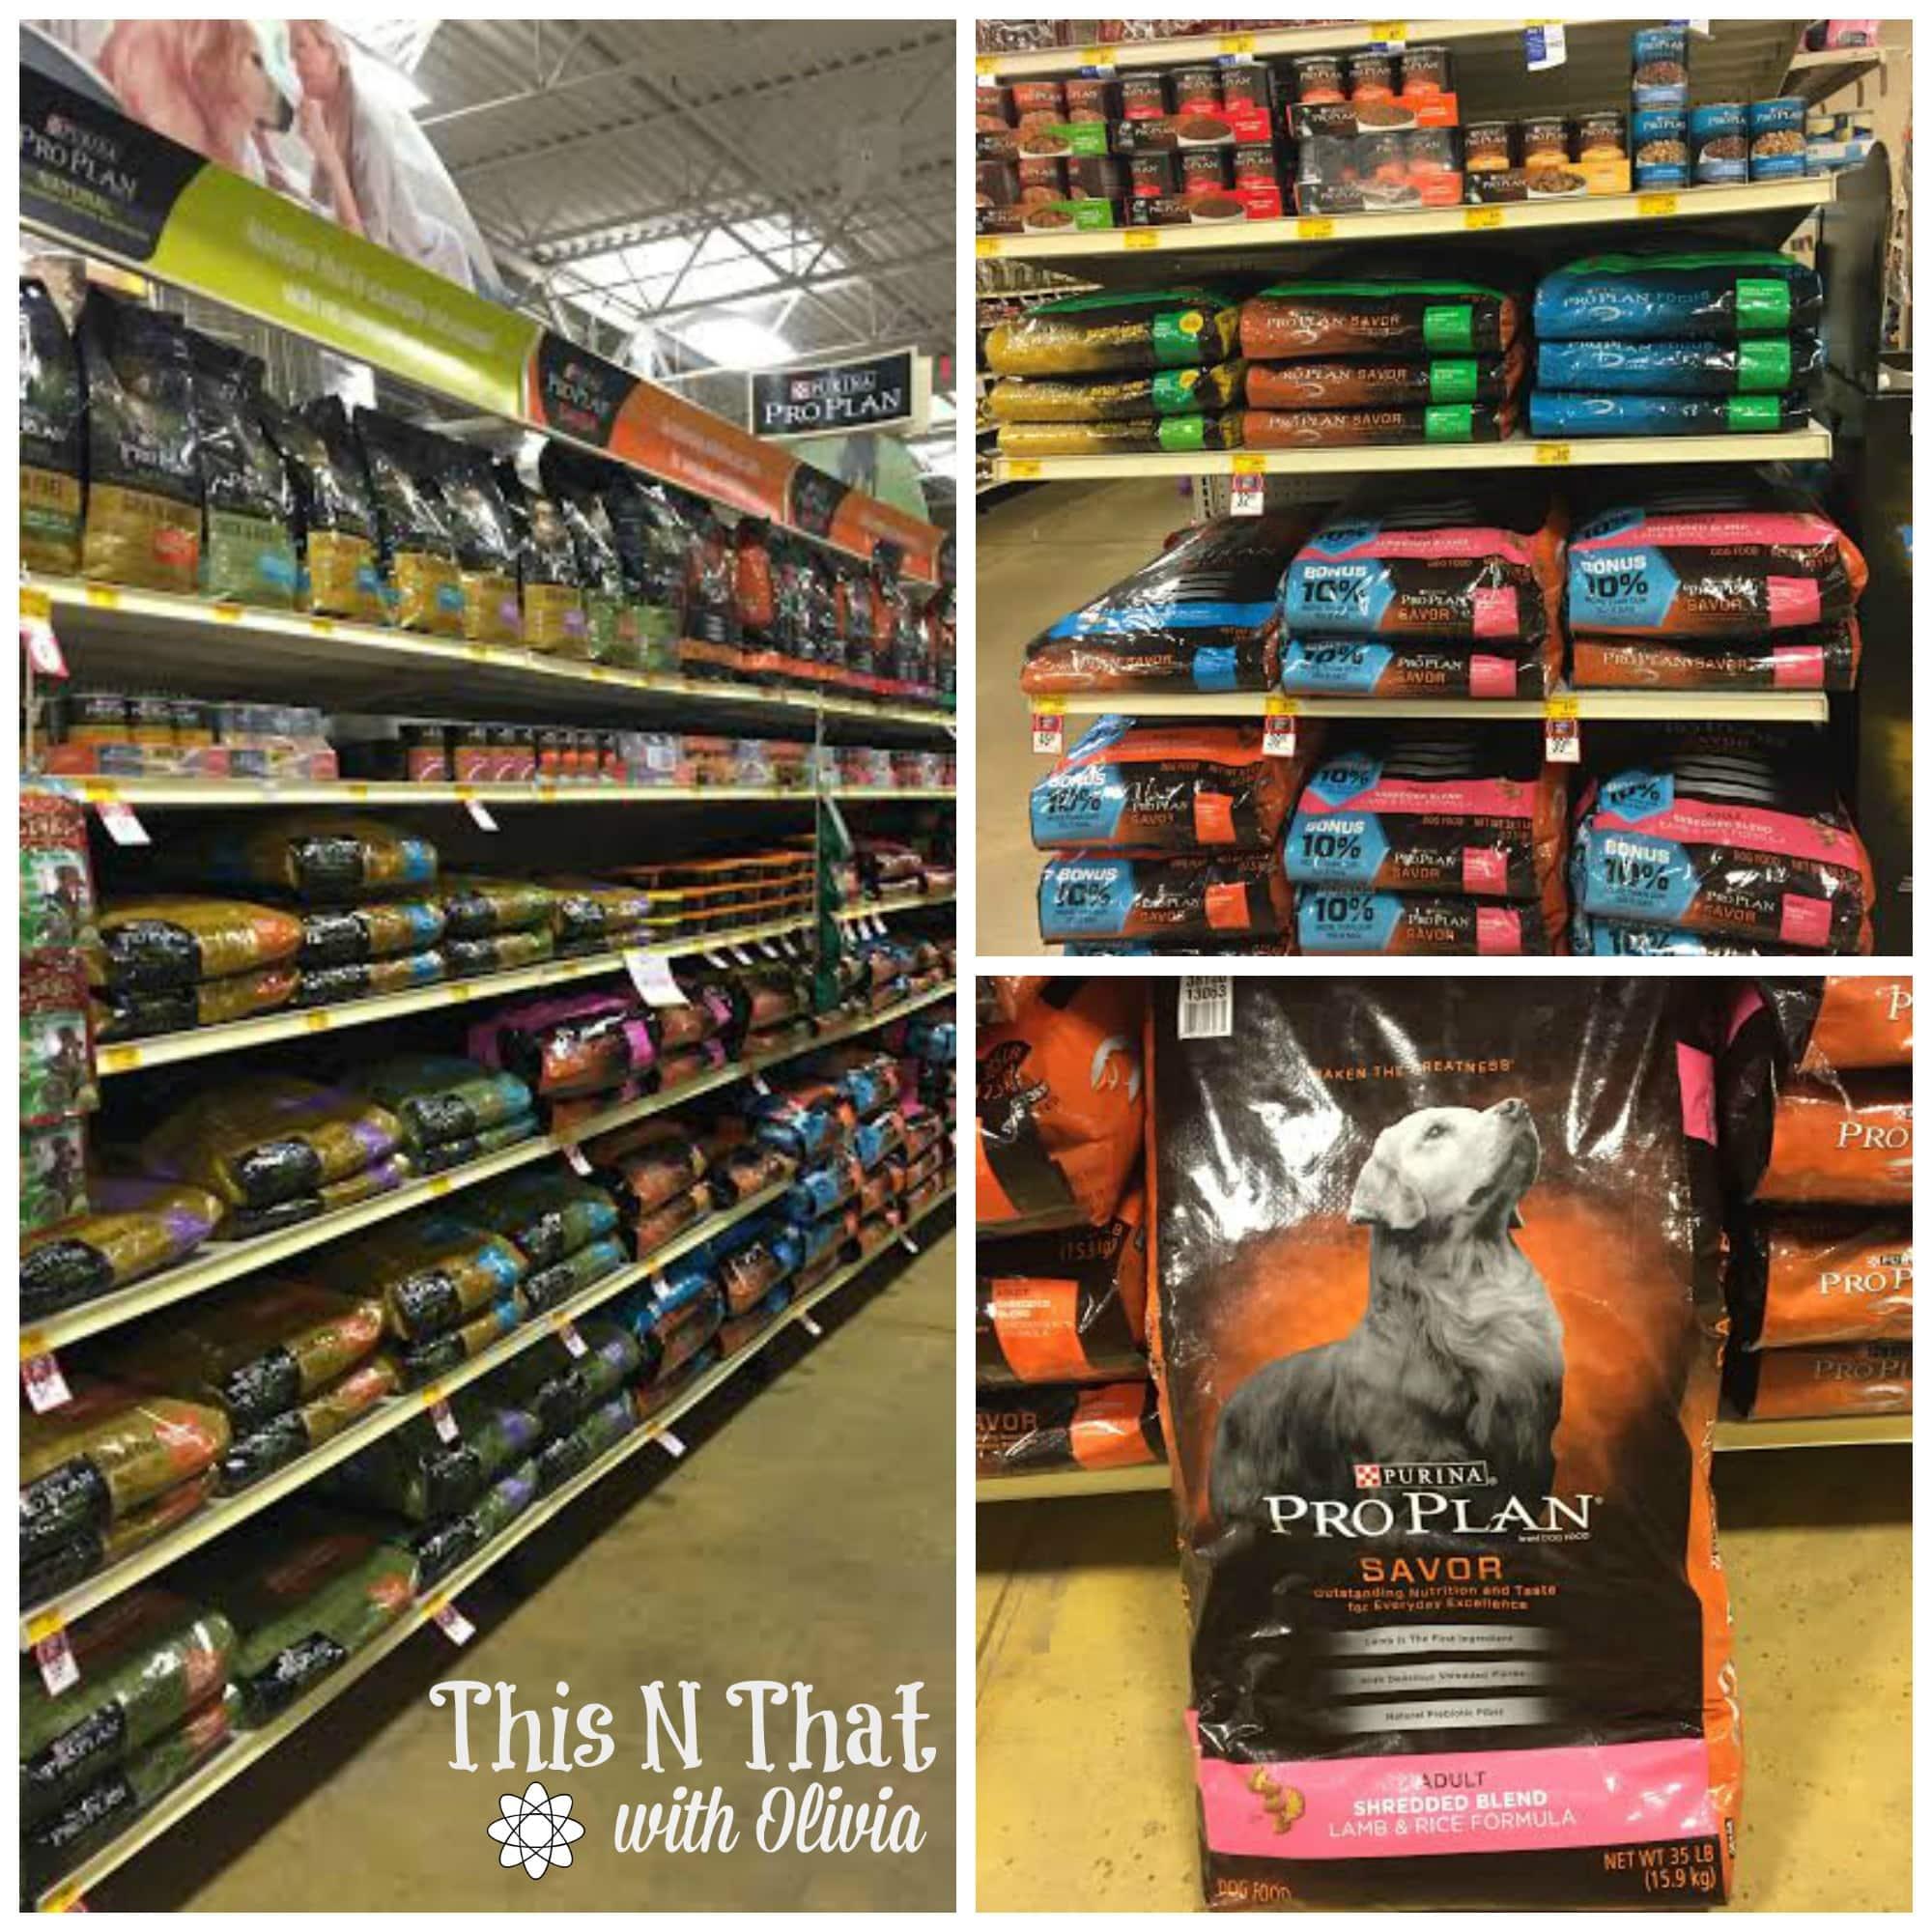 Purina® Pro Plan® Savor® Shredded Blend in PetSmart #PawsToSavor | ThisNThatwithOlivia.com